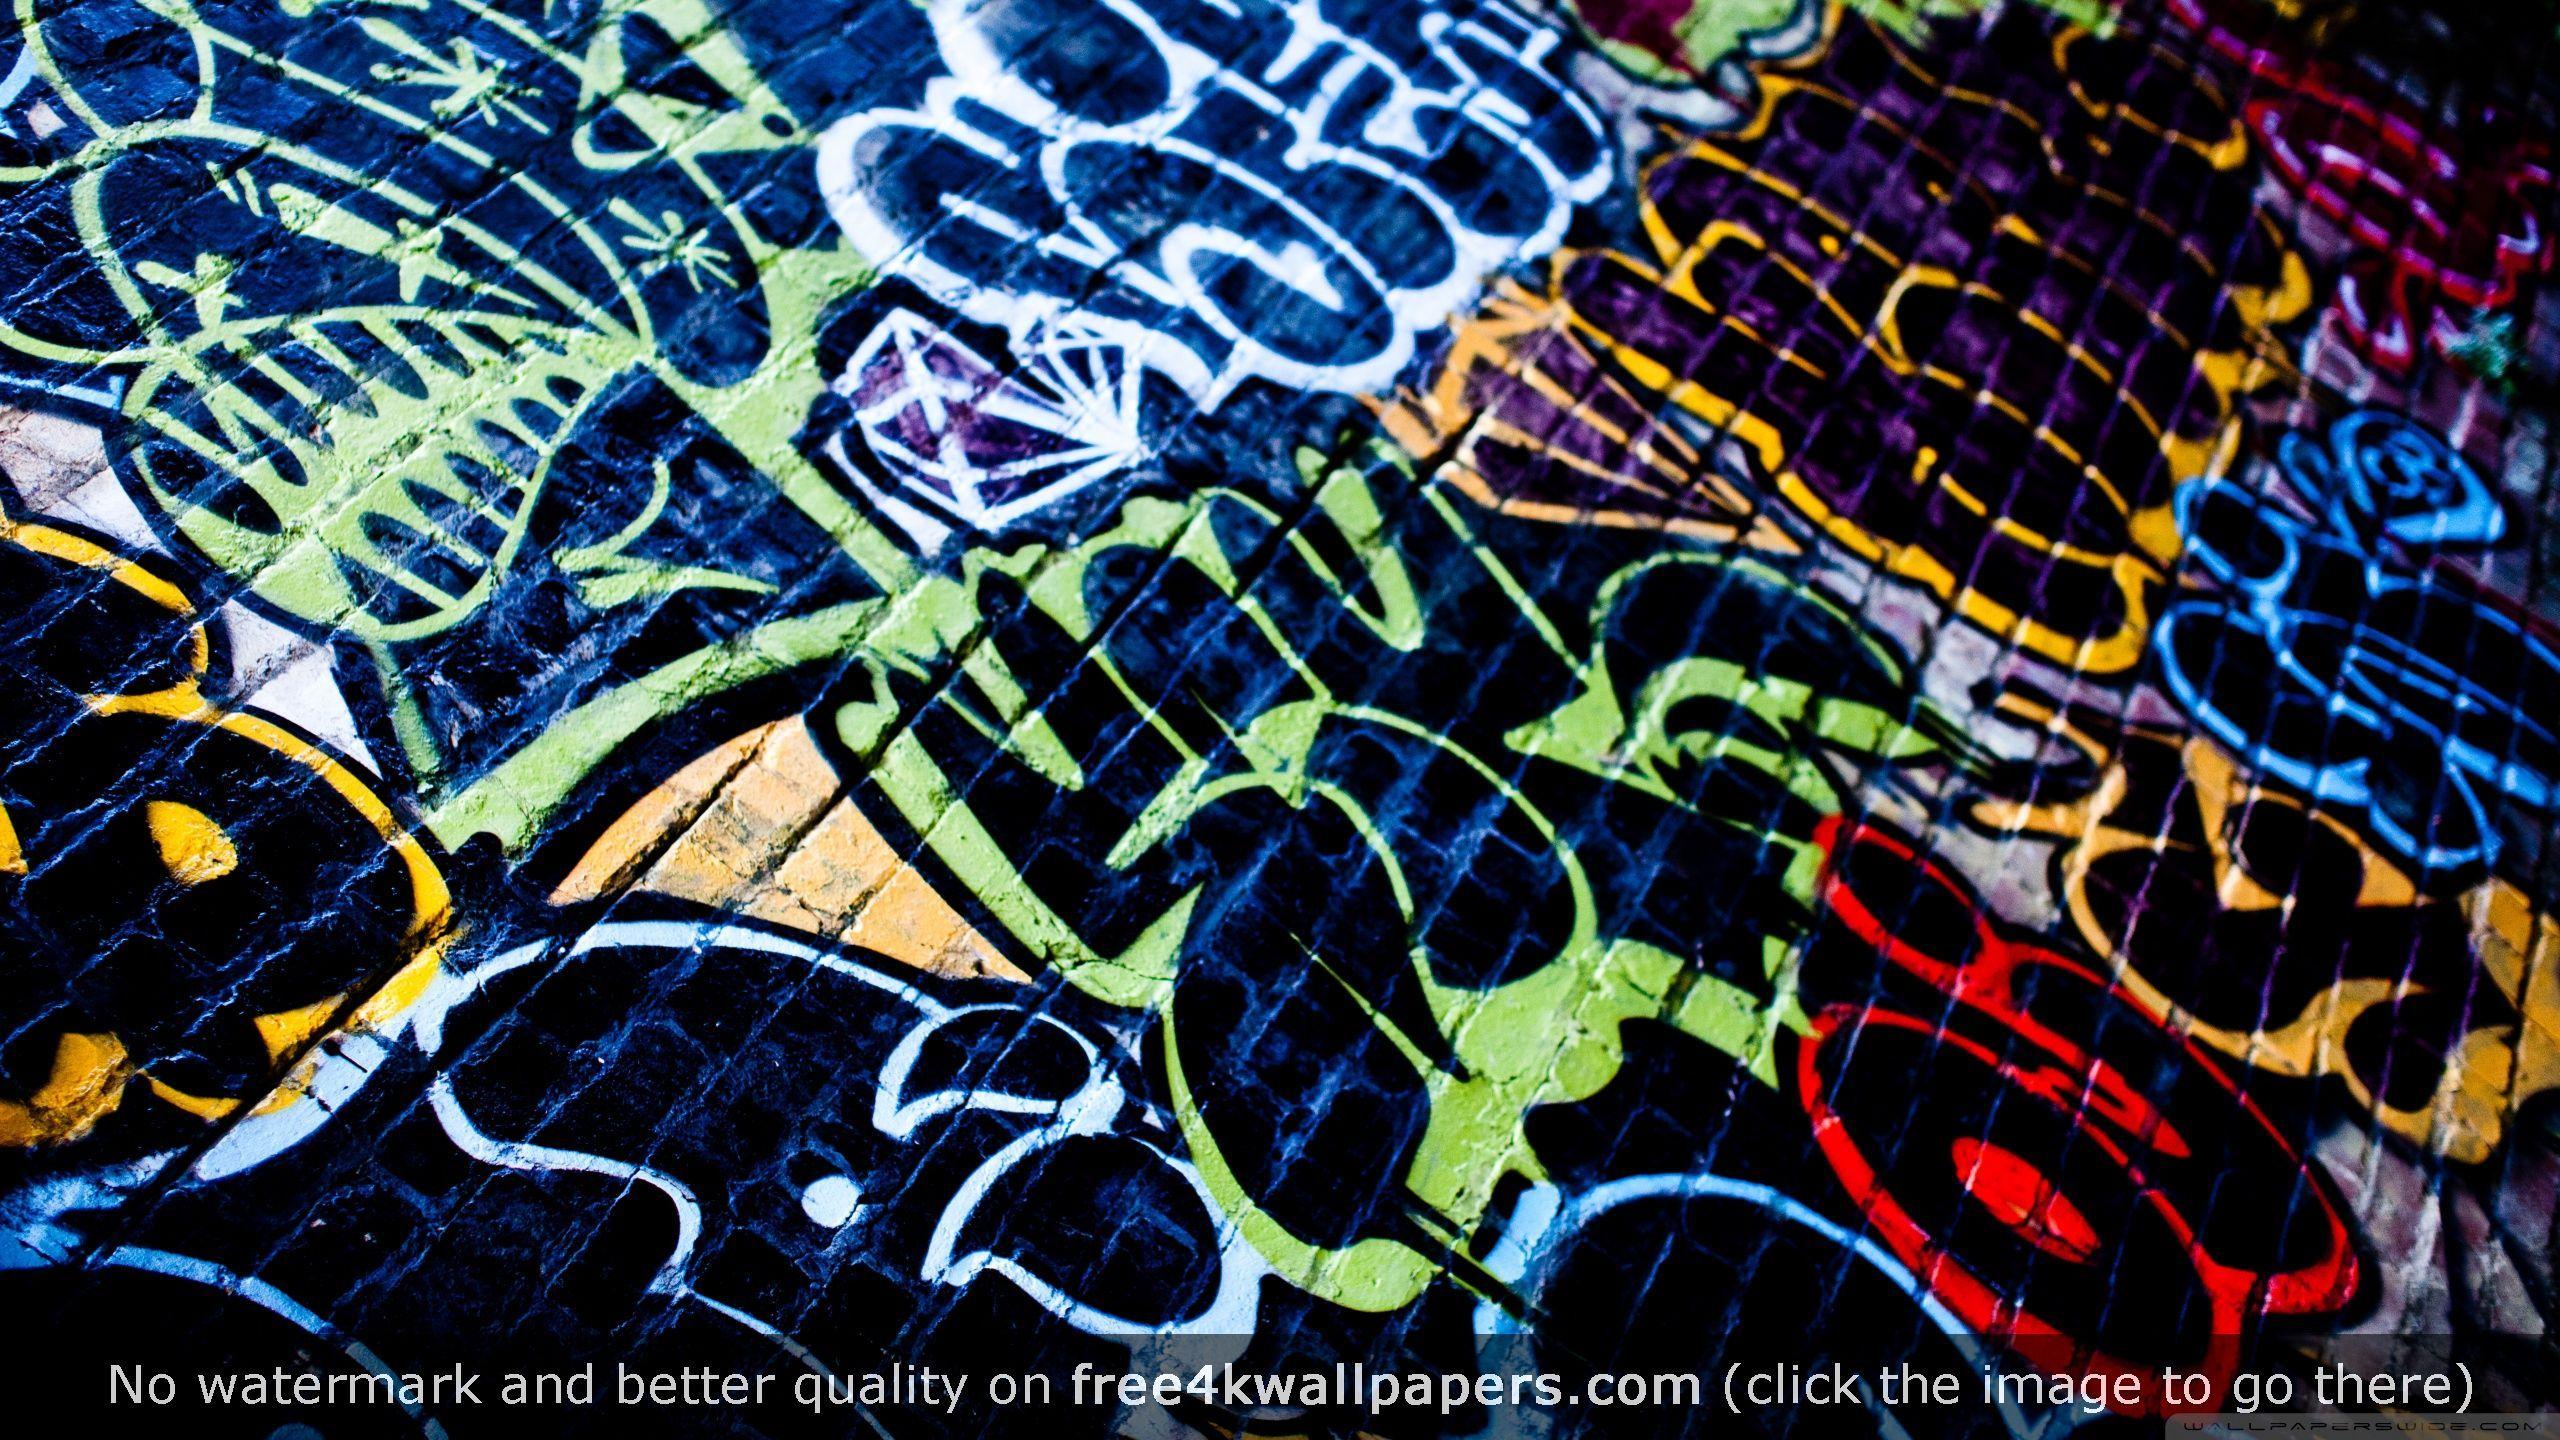 2560x1440px hip hop graffiti wallpaper - wallpapersafari